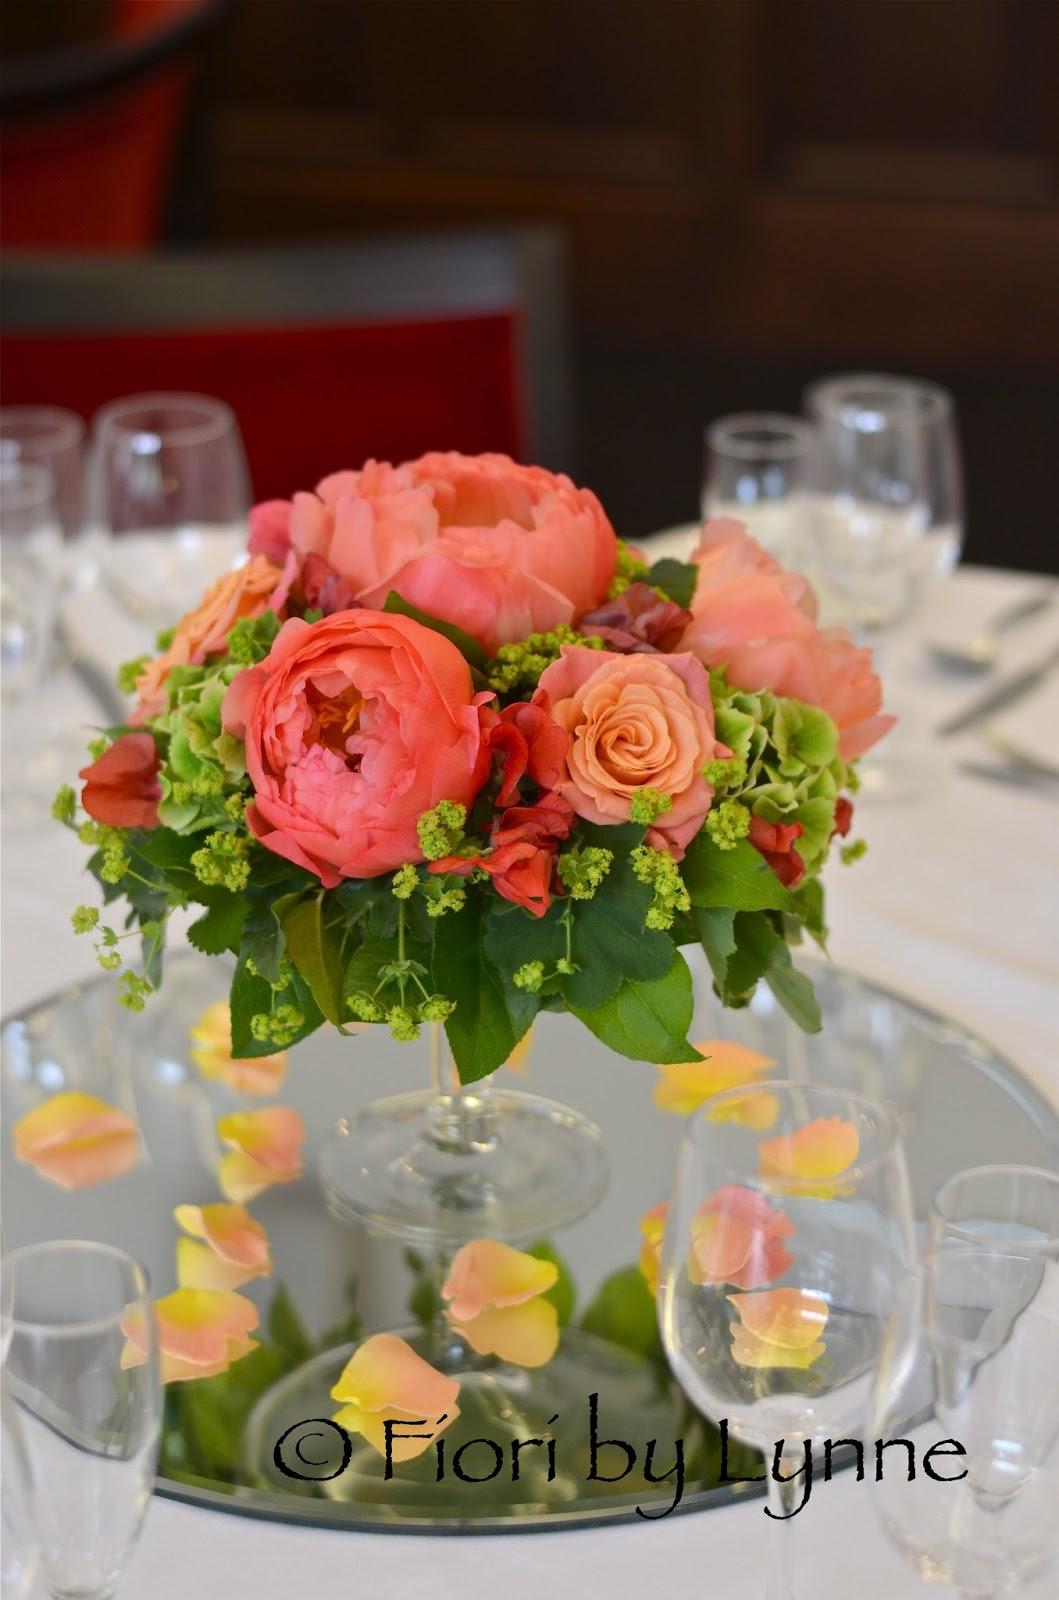 Wedding Flowers Blog: June 2013